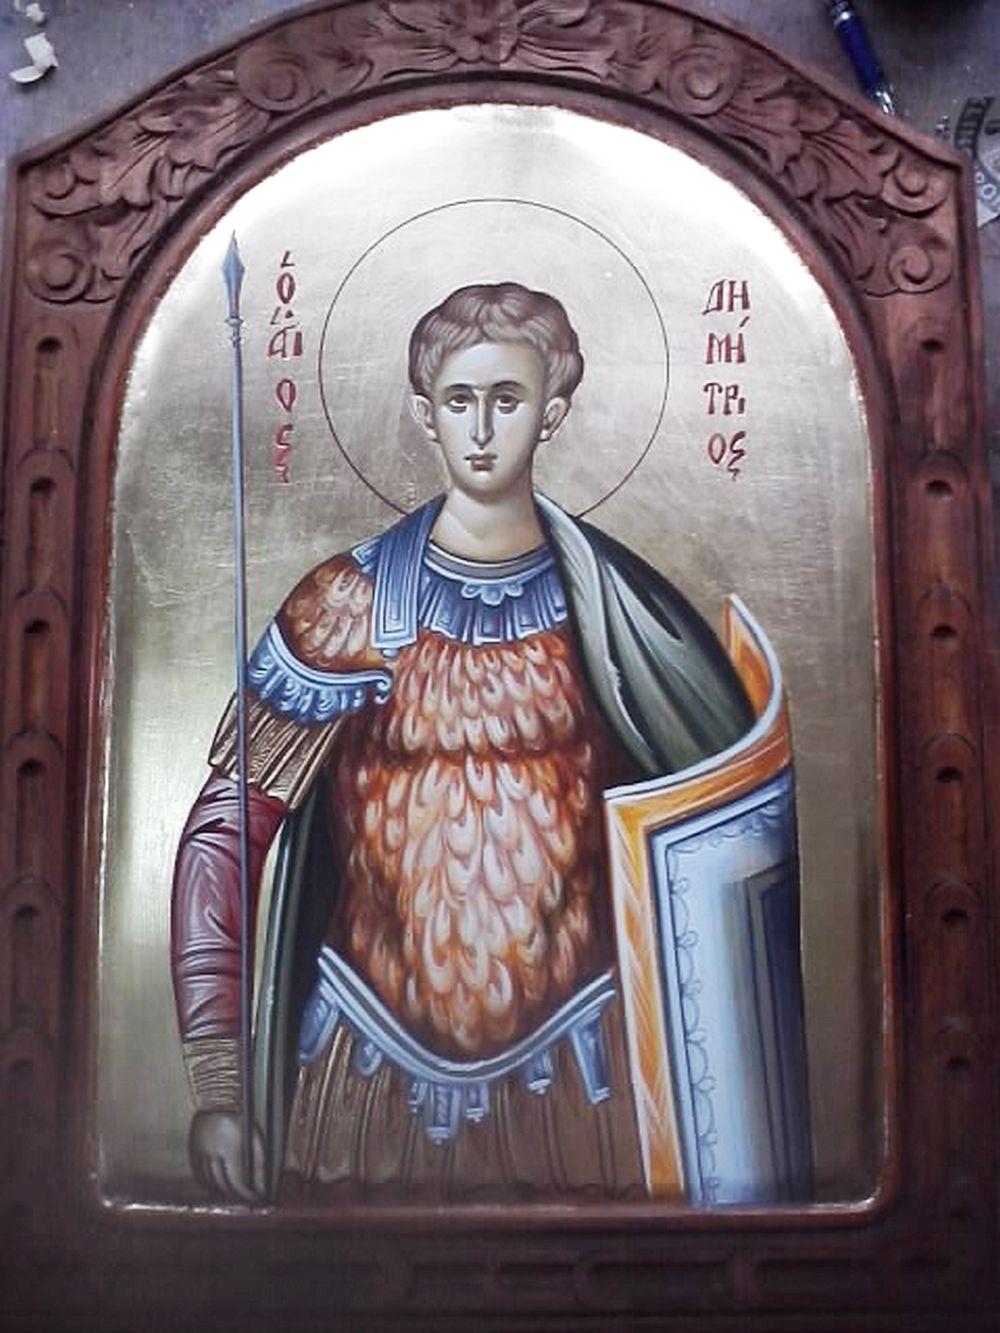 adelaparvu.com despre icoane bizantine pictate de Lorand Kolumban si Jakab Tibor